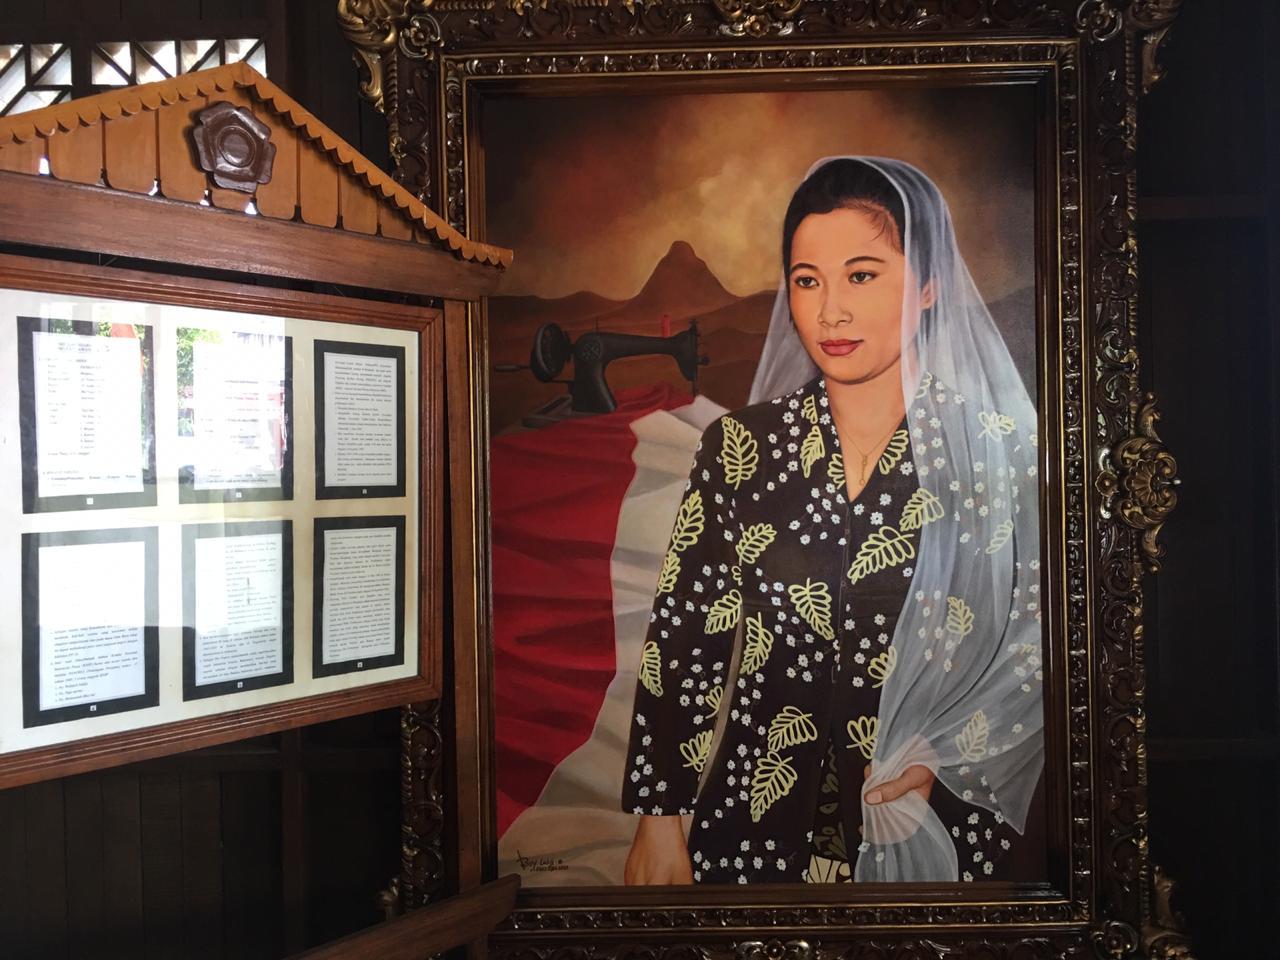 https: img-k.okeinfo.net content 2019 09 04 337 2100713 romansa-soekarno-fatmawati-dari-pengasingan-turun-ke-hati-ljHUkgJLWj.jpg